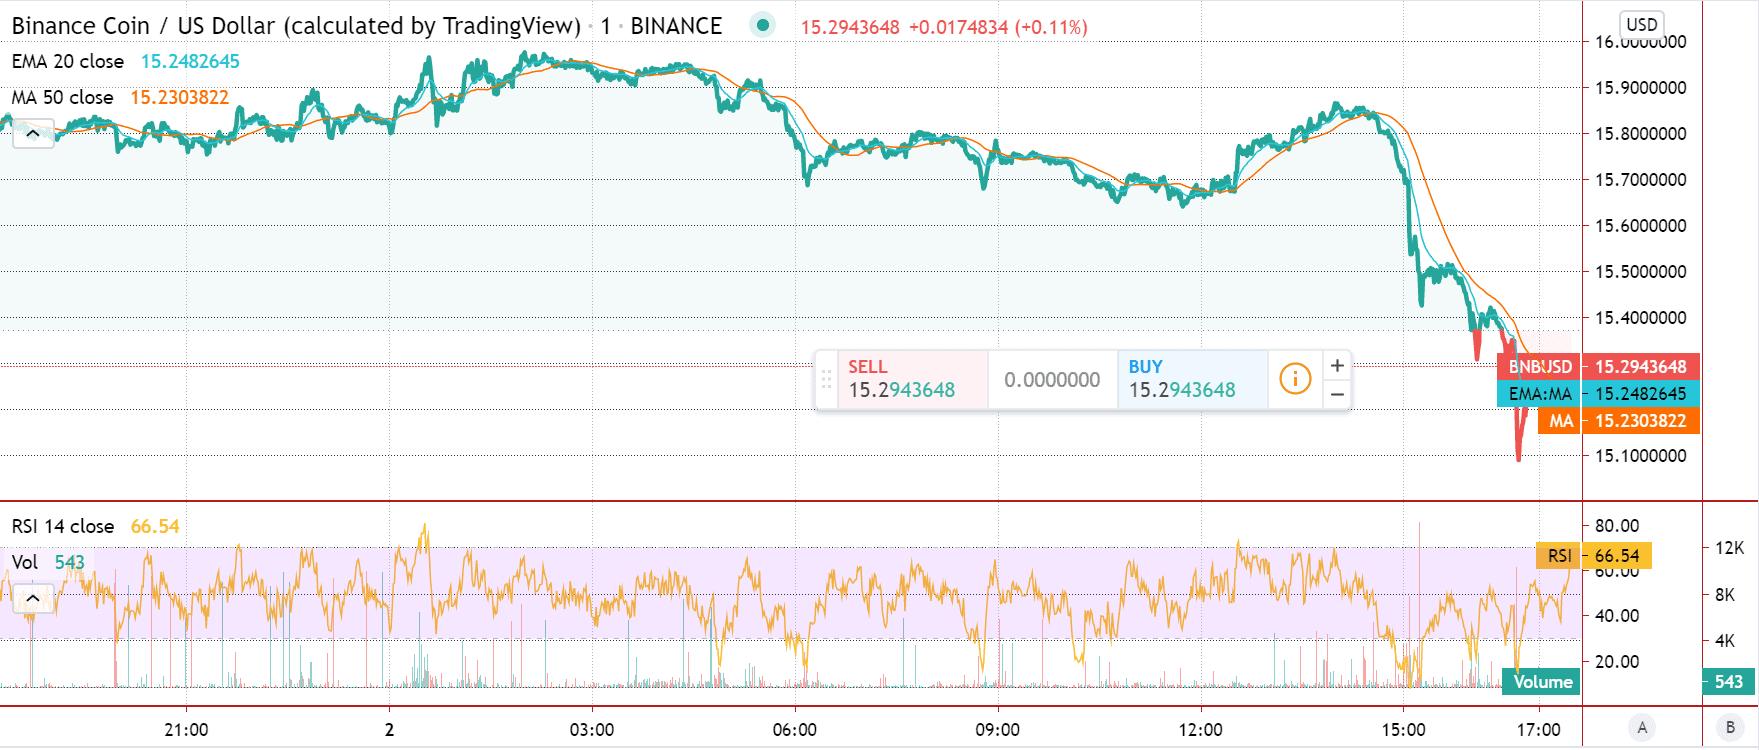 Binance Coin price chart 2 - 2 July